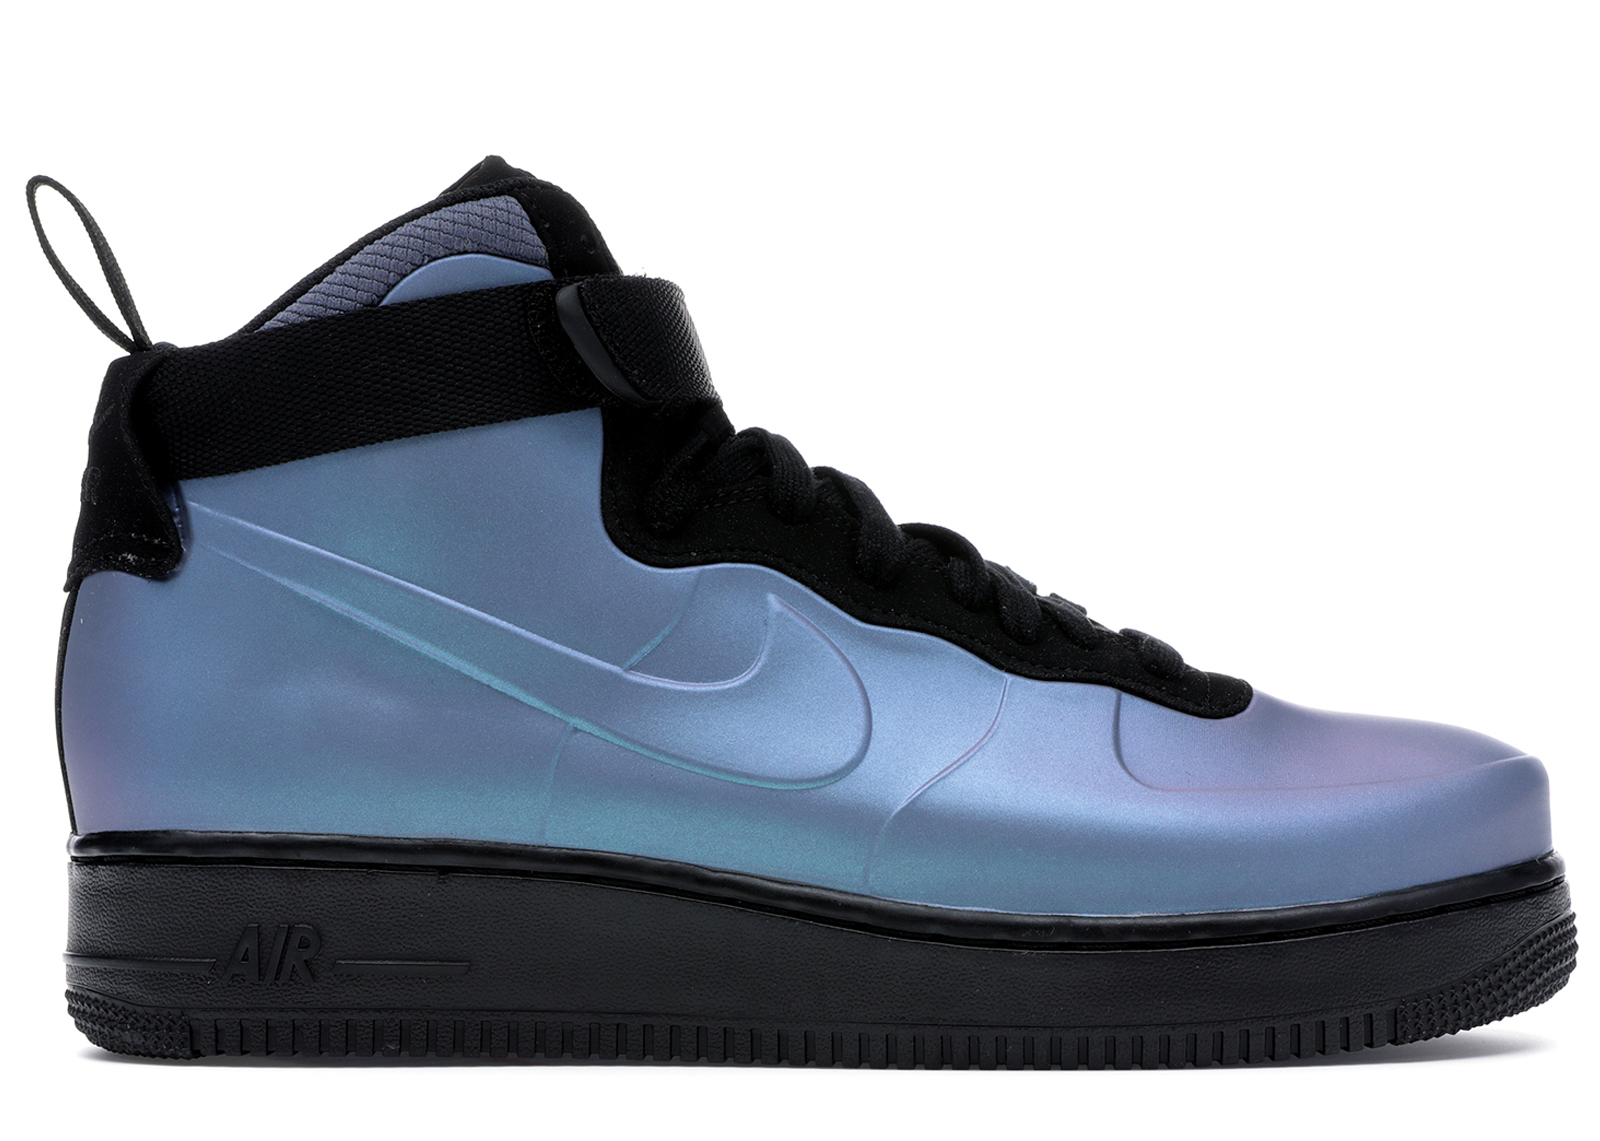 Nike Air Force 1 Foamposite Light Carbon AH6771 002